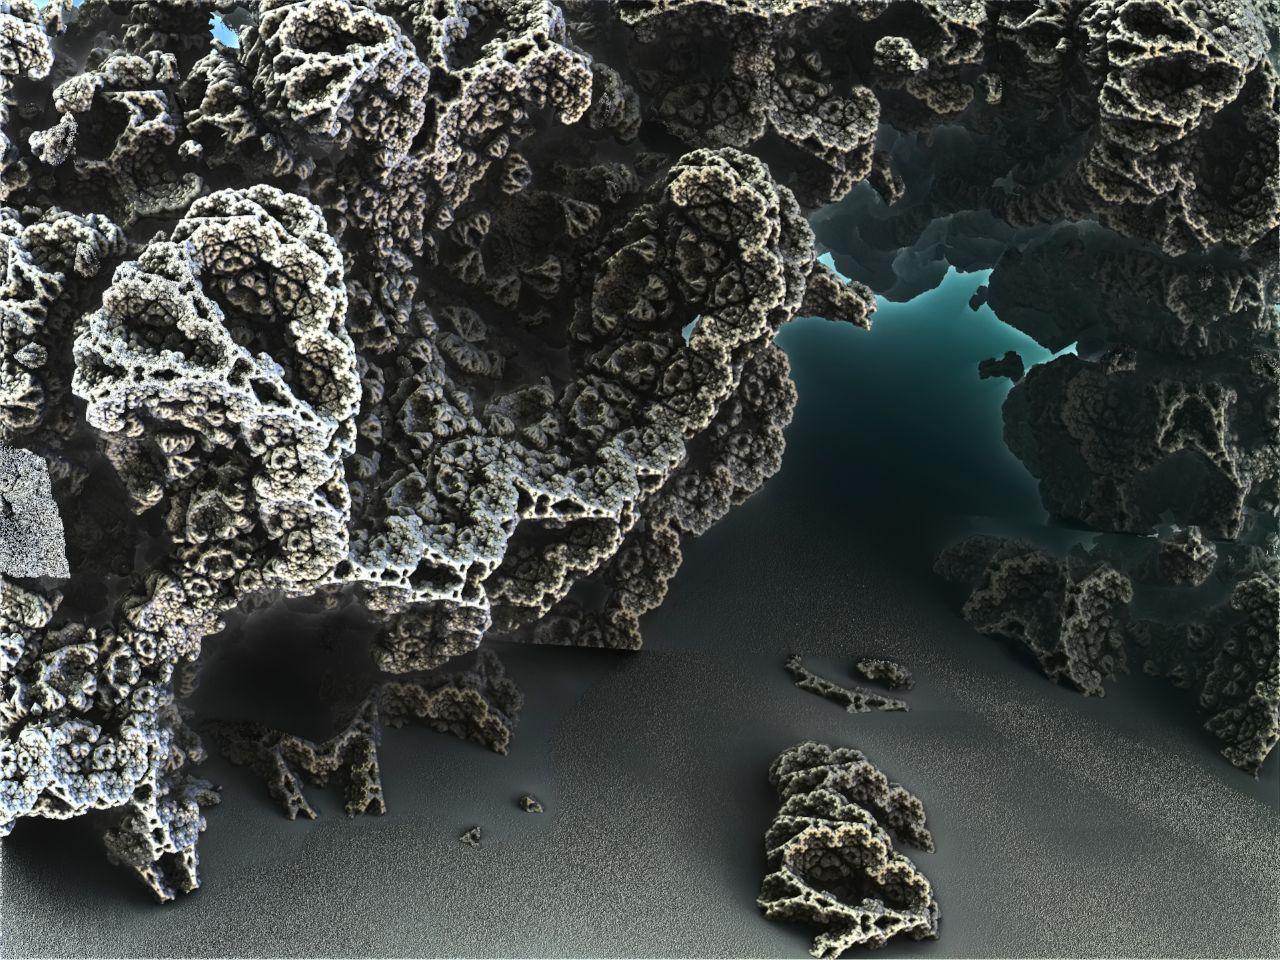 Mulewings: Mandelbulb IFS formulas DEcombinate & Reflectons